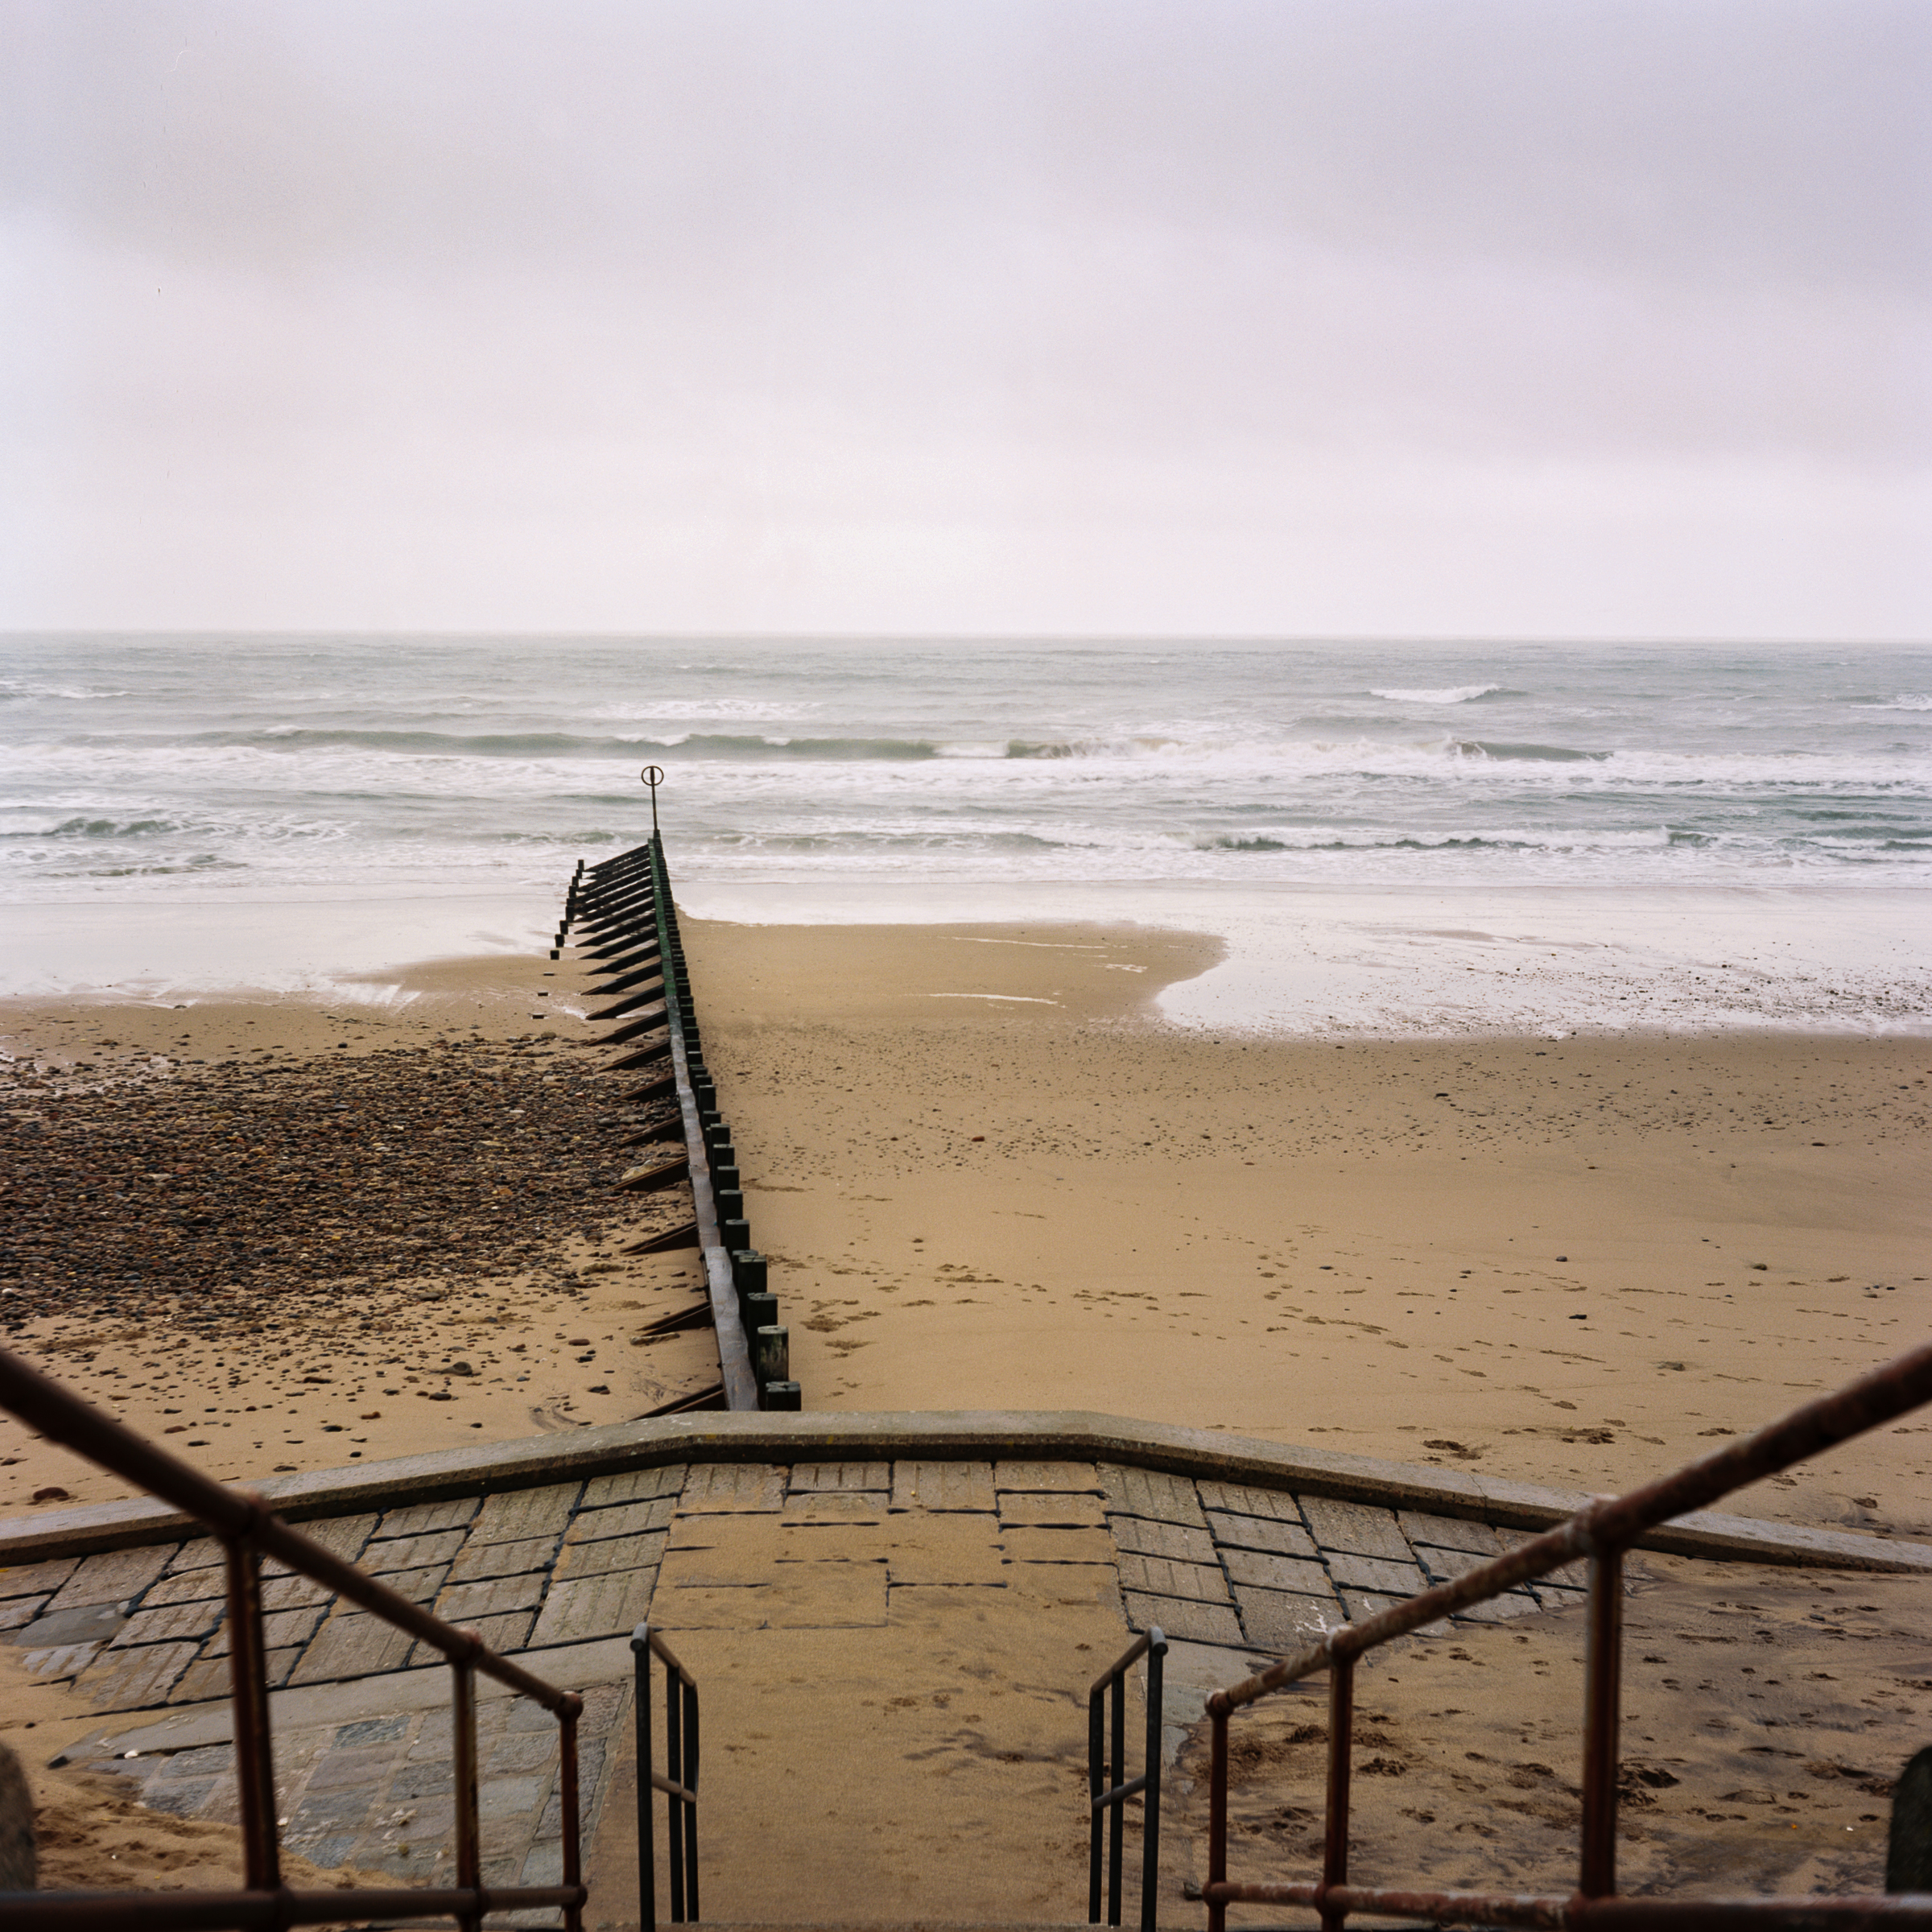 Aberdeen Beach - Kodak Ektar 100